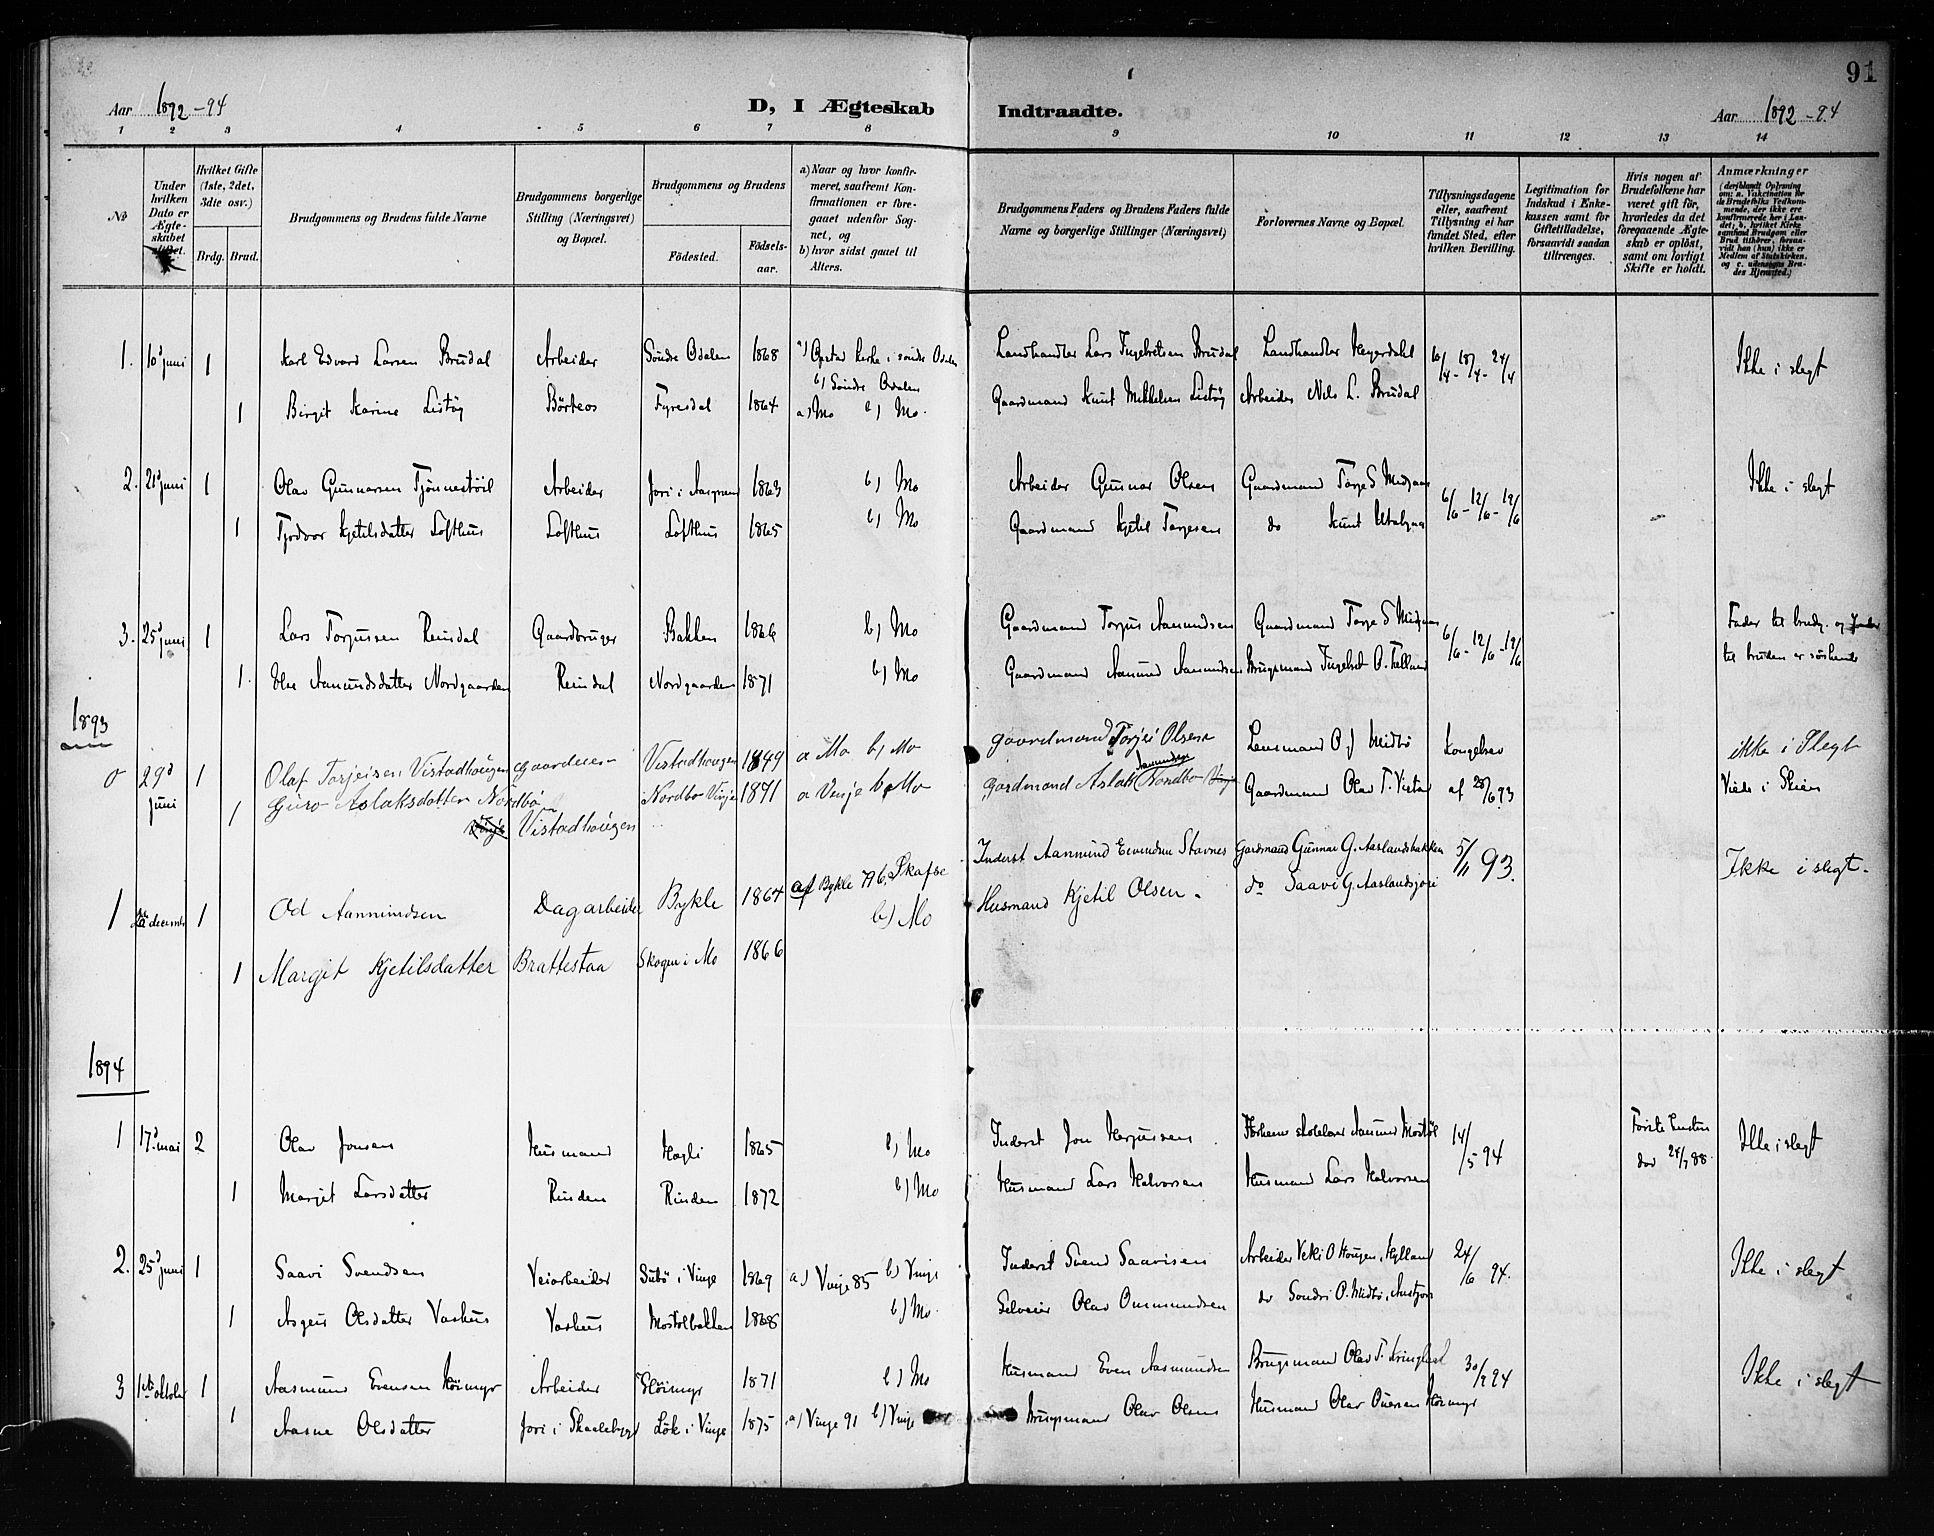 SAKO, Mo kirkebøker, G/Ga/L0002: Klokkerbok nr. I 2, 1892-1914, s. 91